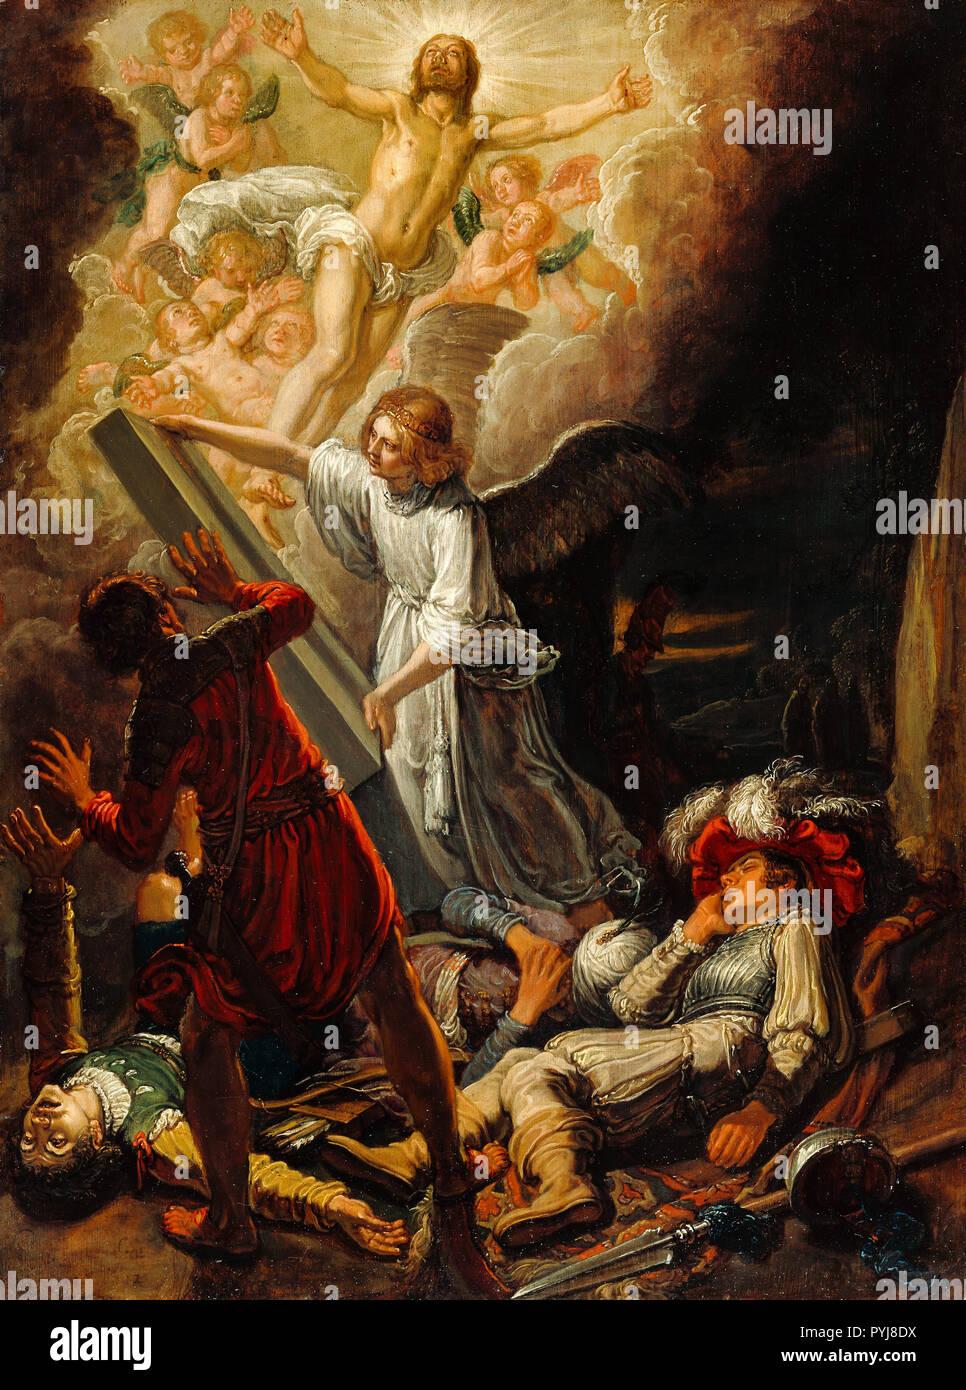 Pieter Lastman, The Resurrection 1612 Oil on panel, The J. Paul Getty Museum, Los Angeles, USA. - Stock Image